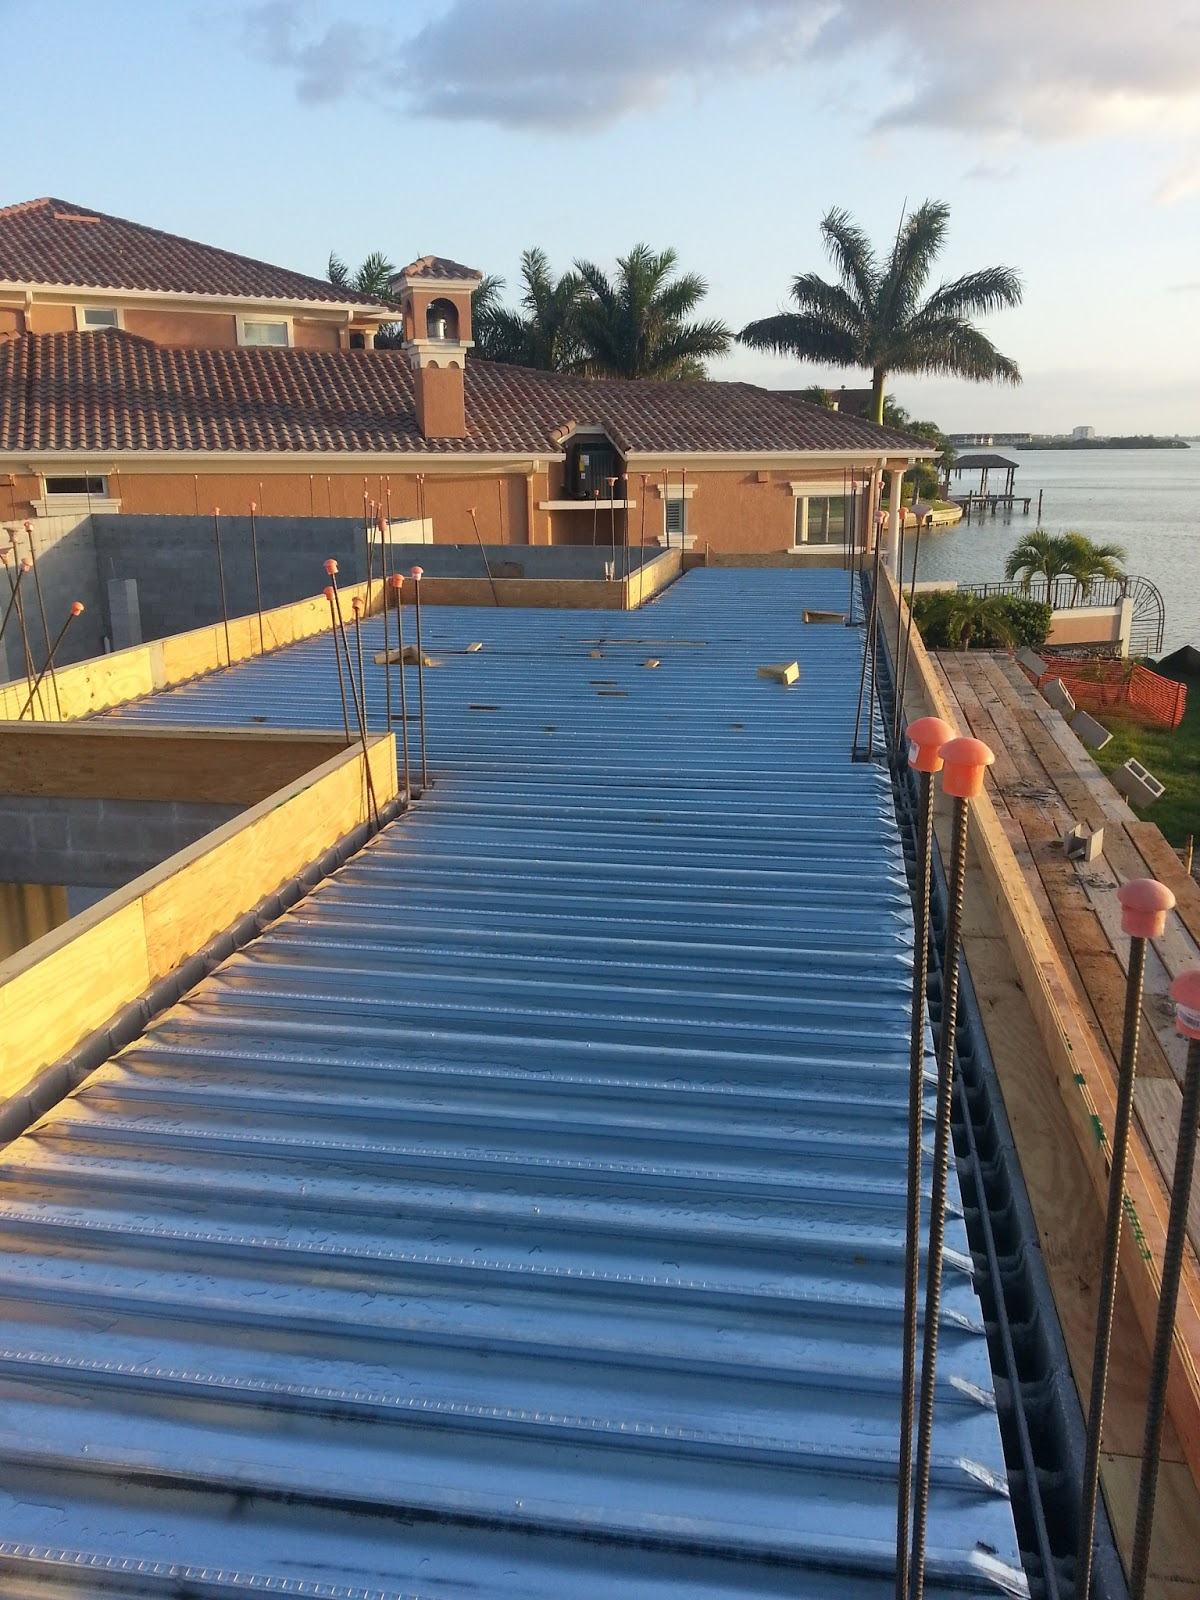 The Barcia Residence Epicore Balcony Decks